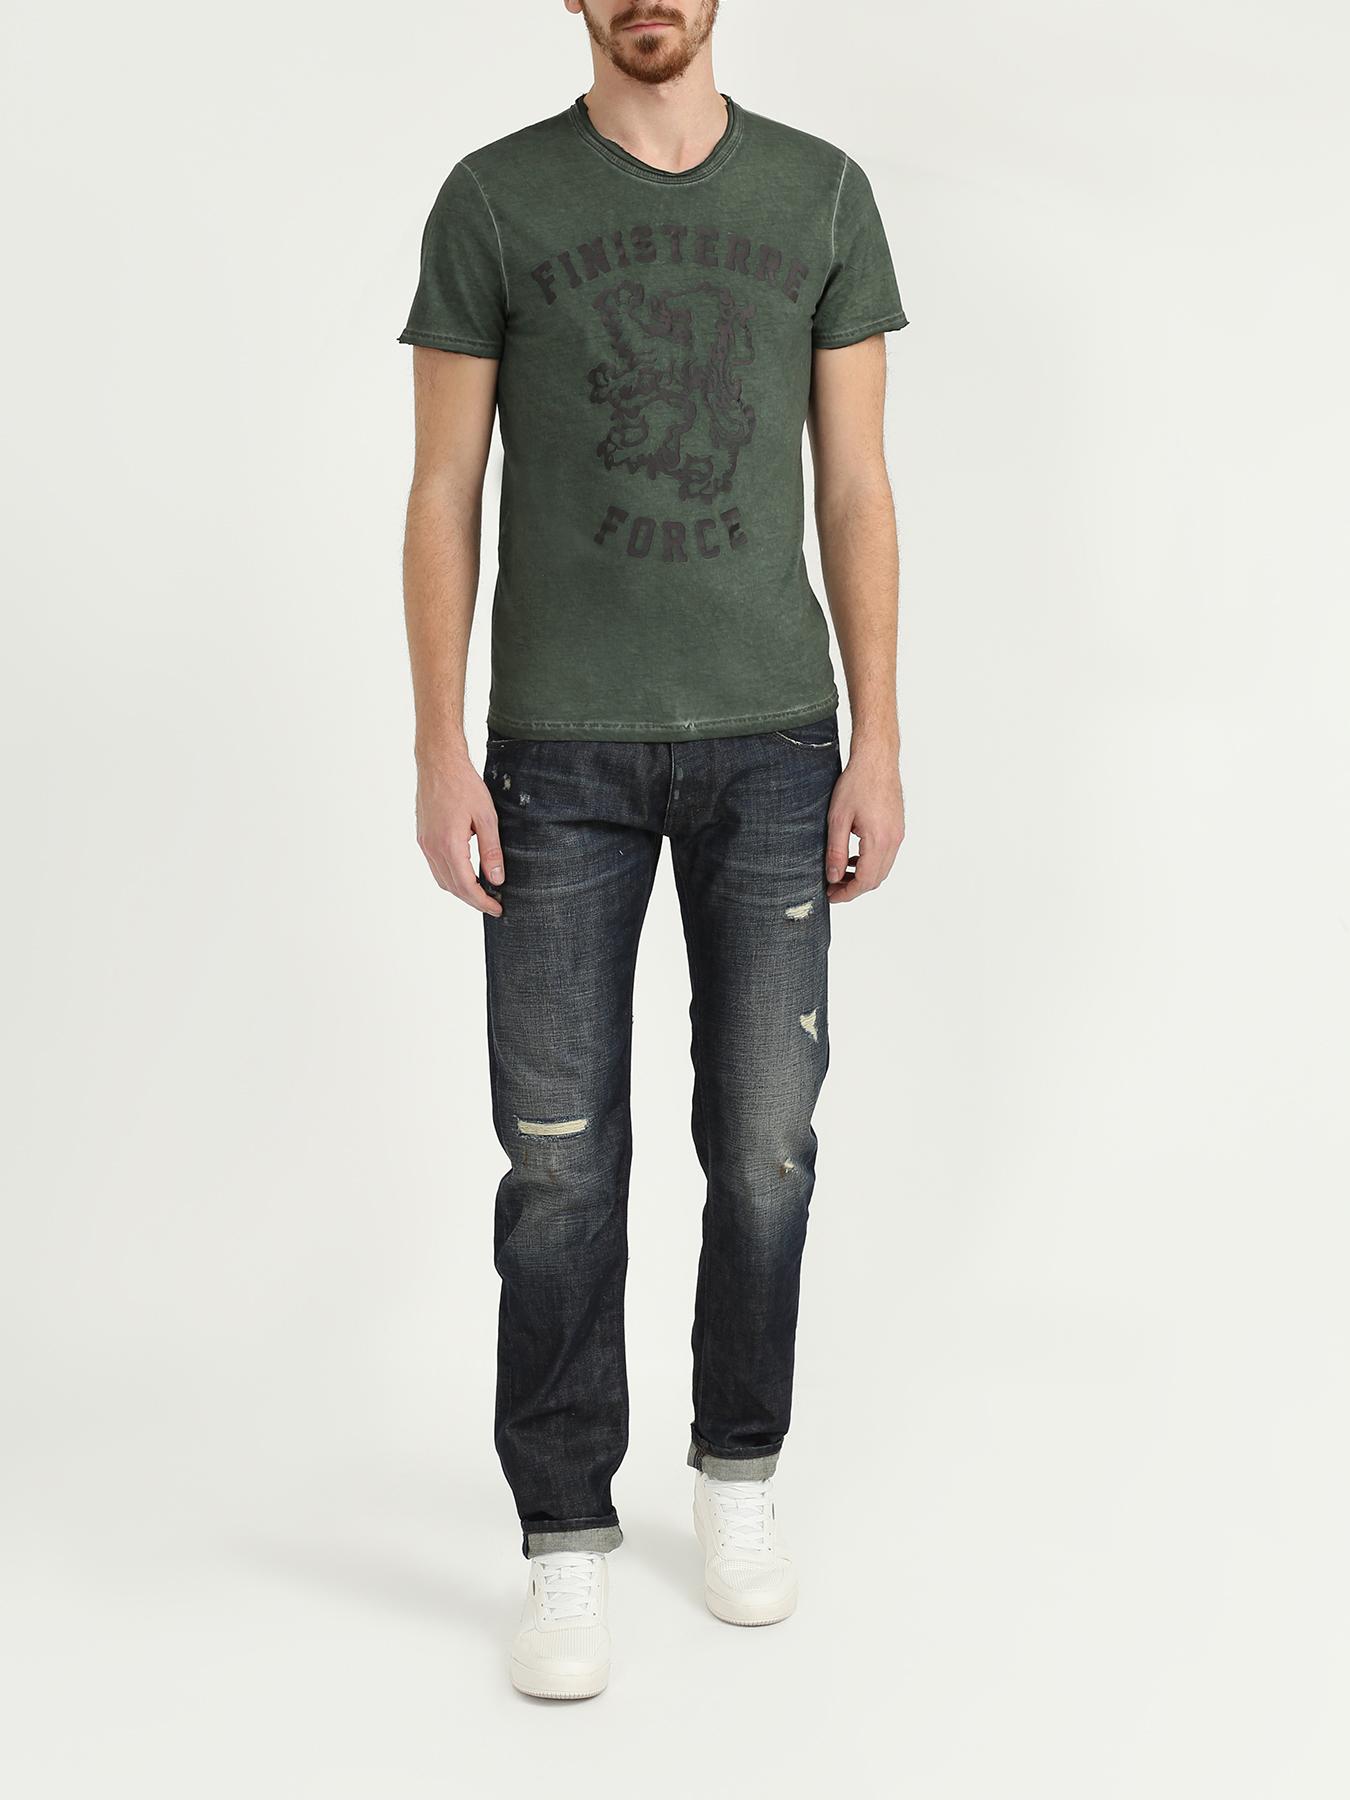 Фото - Брюки Finisterre Мужские джинсы джинсы мужские prps fury